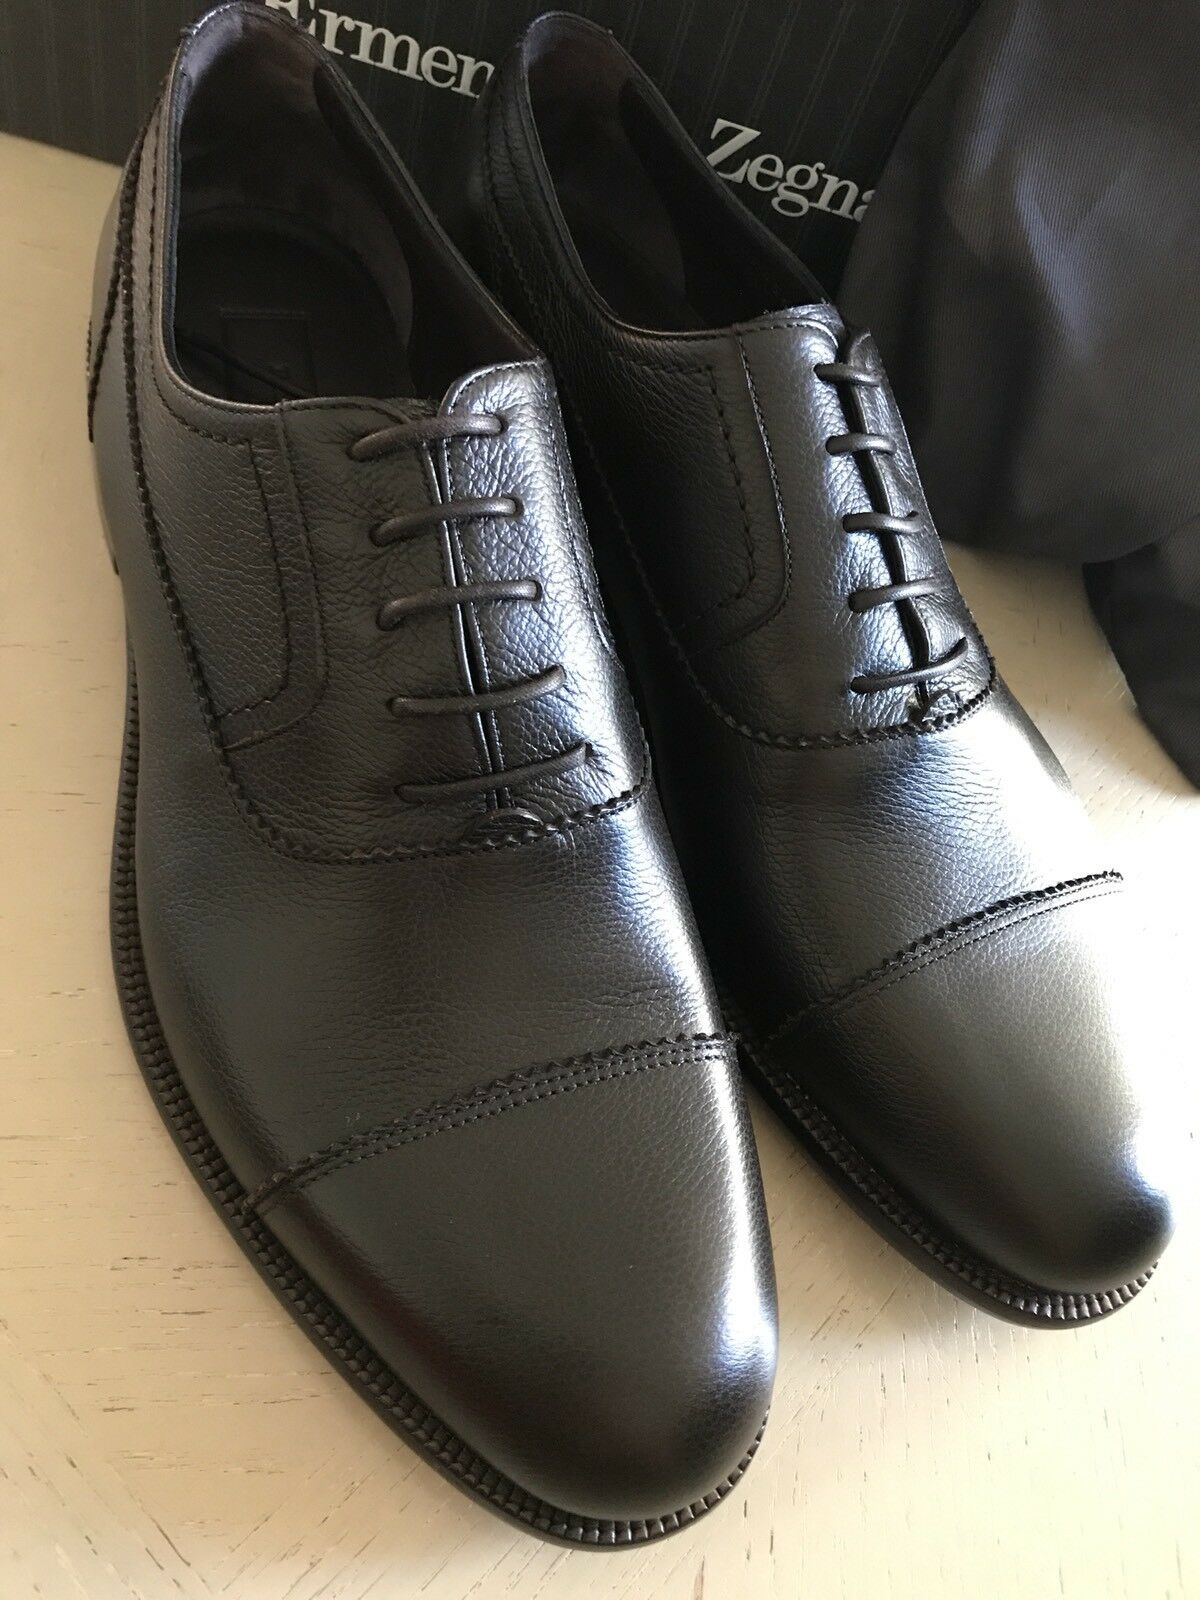 New  695 695 695 Ermenegildo Zegna Oxford Shoes DK Brown 11.5 US ( 44.5 Eu ) Italy 982fff